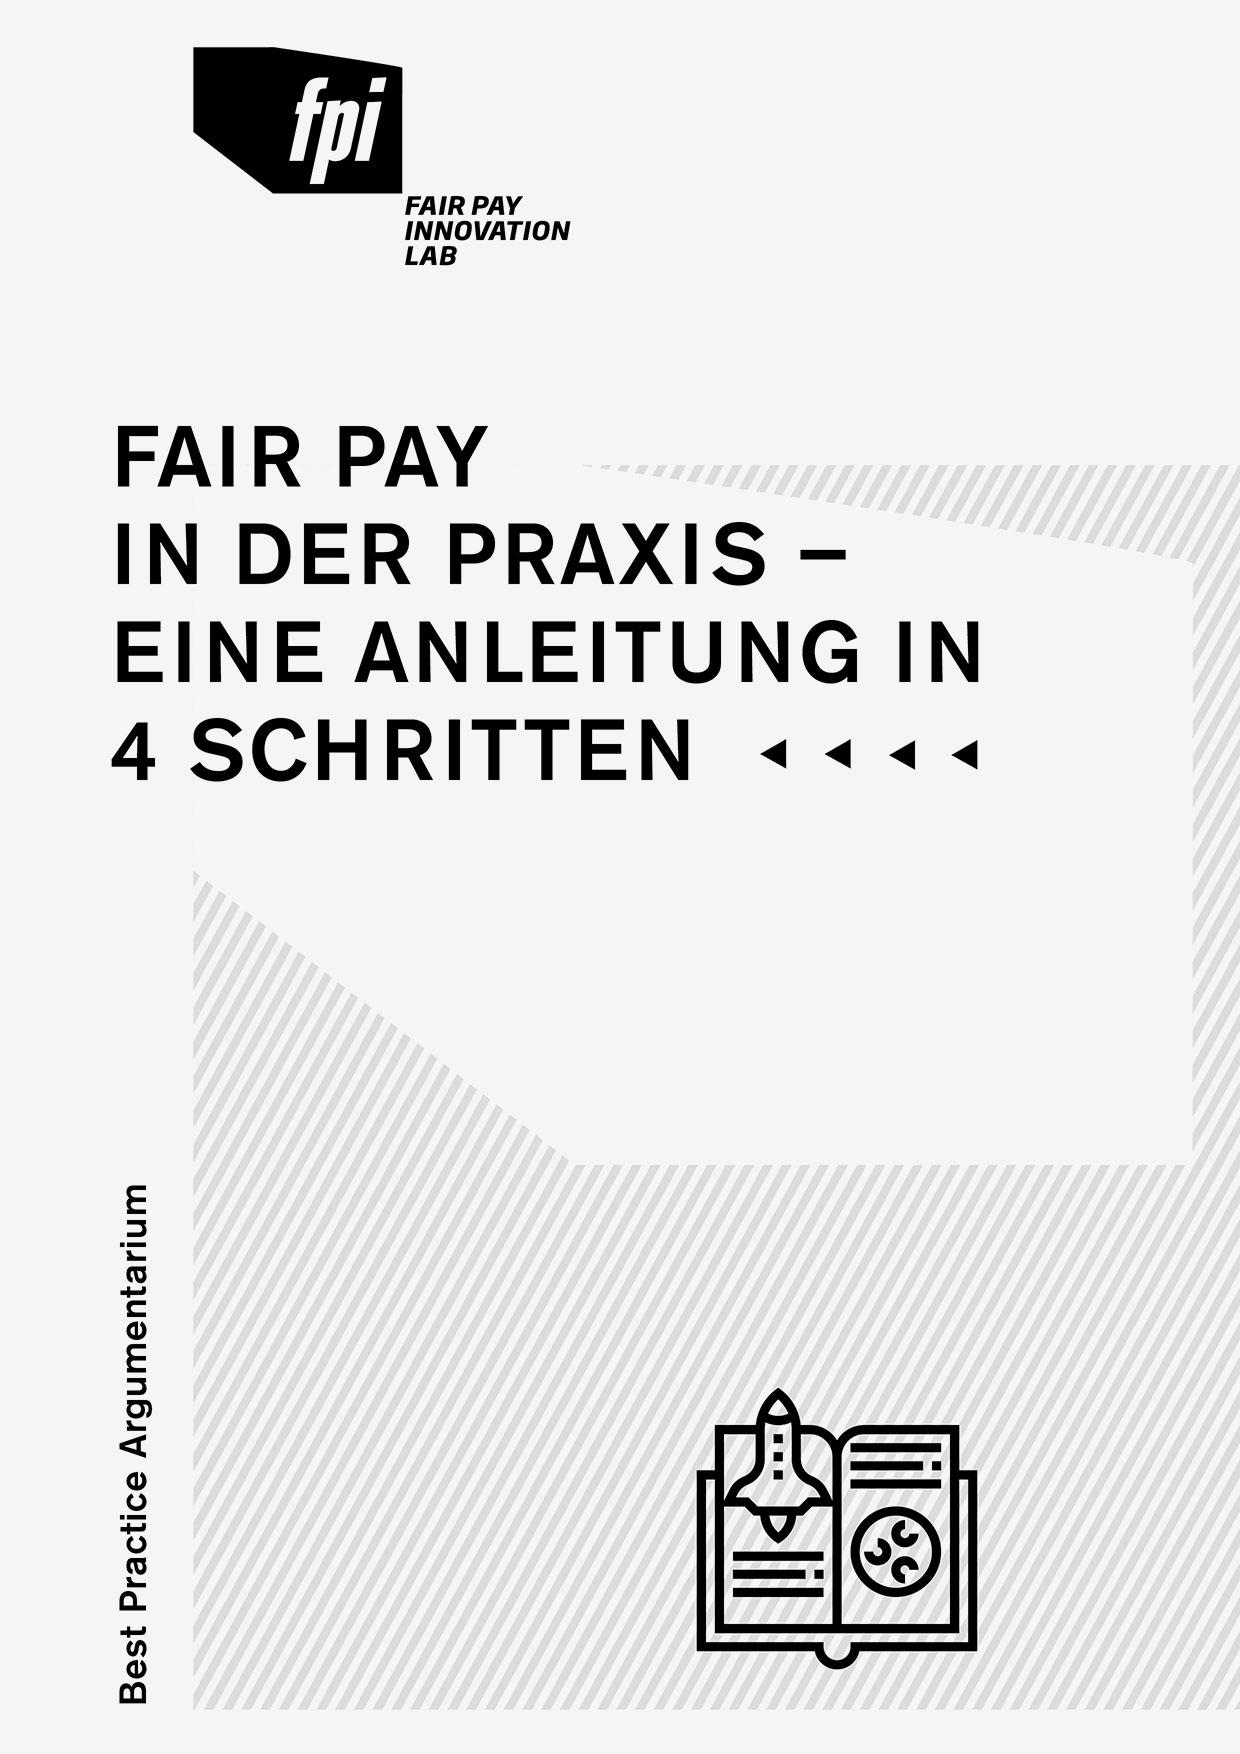 Broschüre Best Practice Argumentarium, gestaltet von Zech Dombrowsky Design